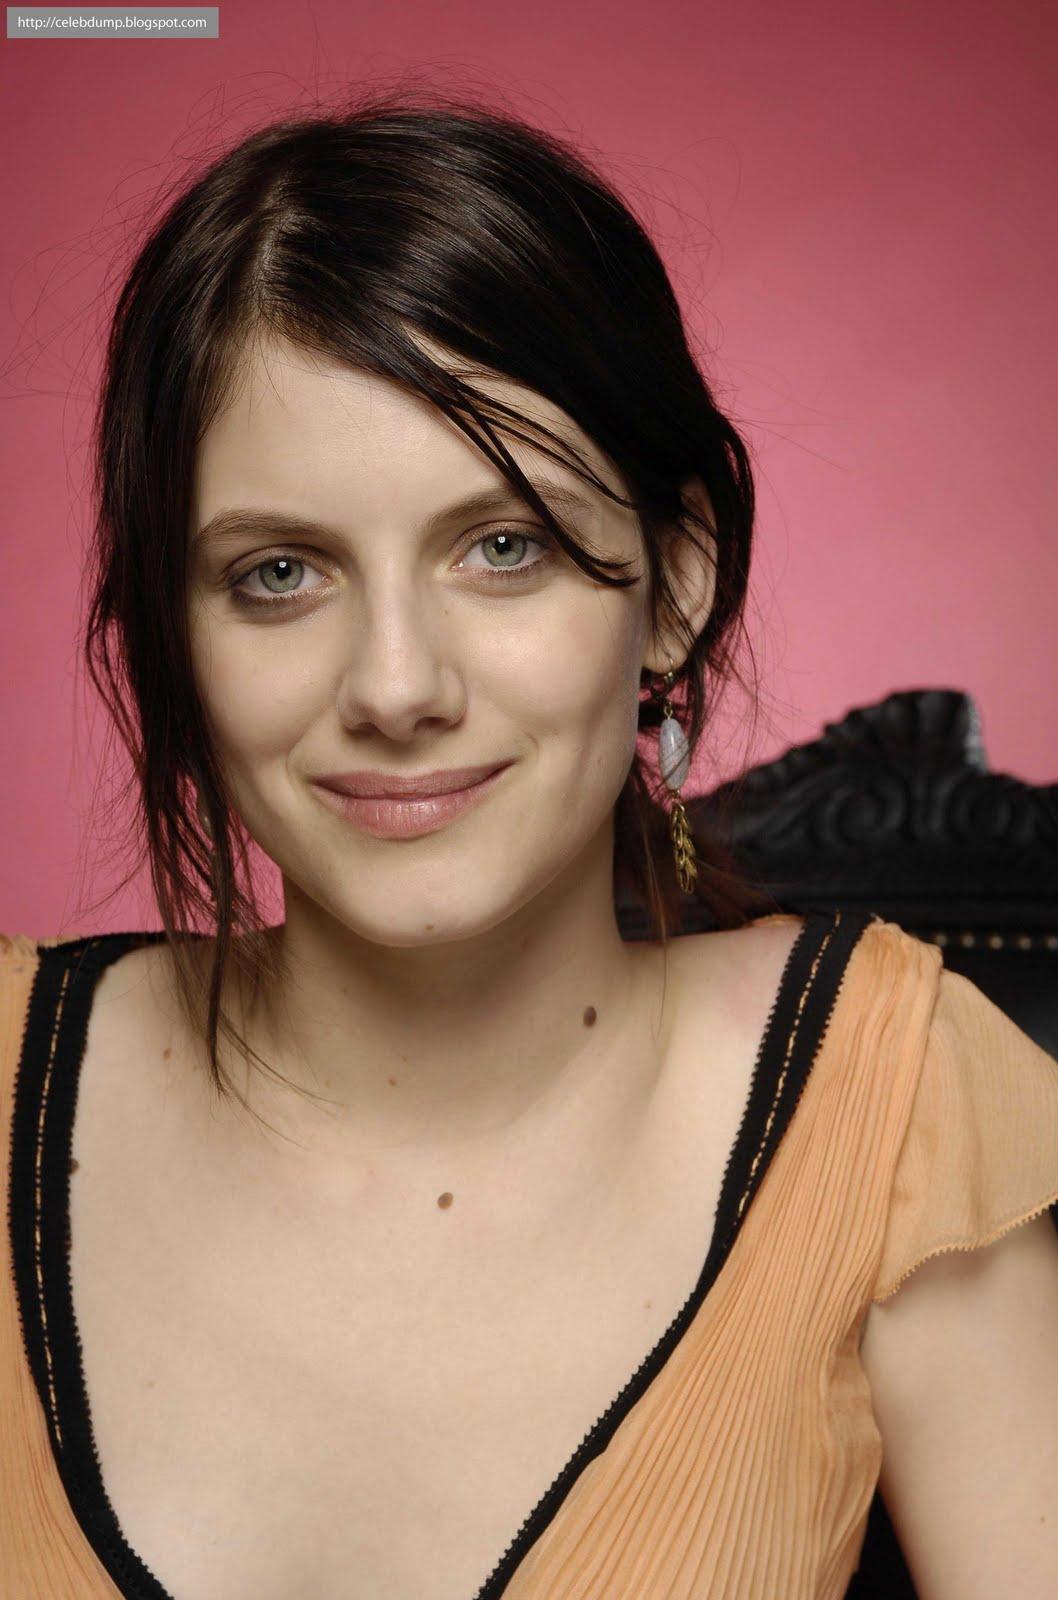 http://1.bp.blogspot.com/_k0qcqtNtpOY/S9uU4xZYJRI/AAAAAAAAOEY/RU2LJzwLLT8/s1600/melanie-laurent-brunette-celebdump04.jpg